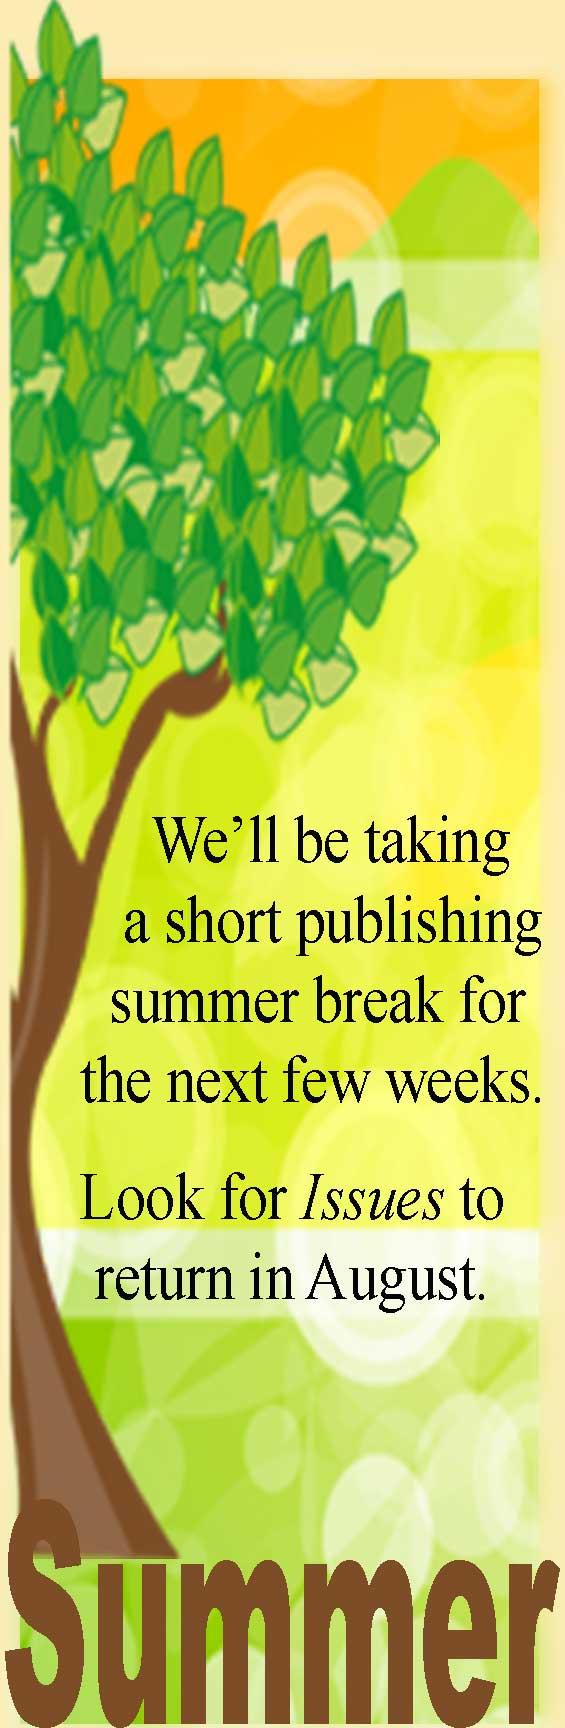 Summer Break 2013